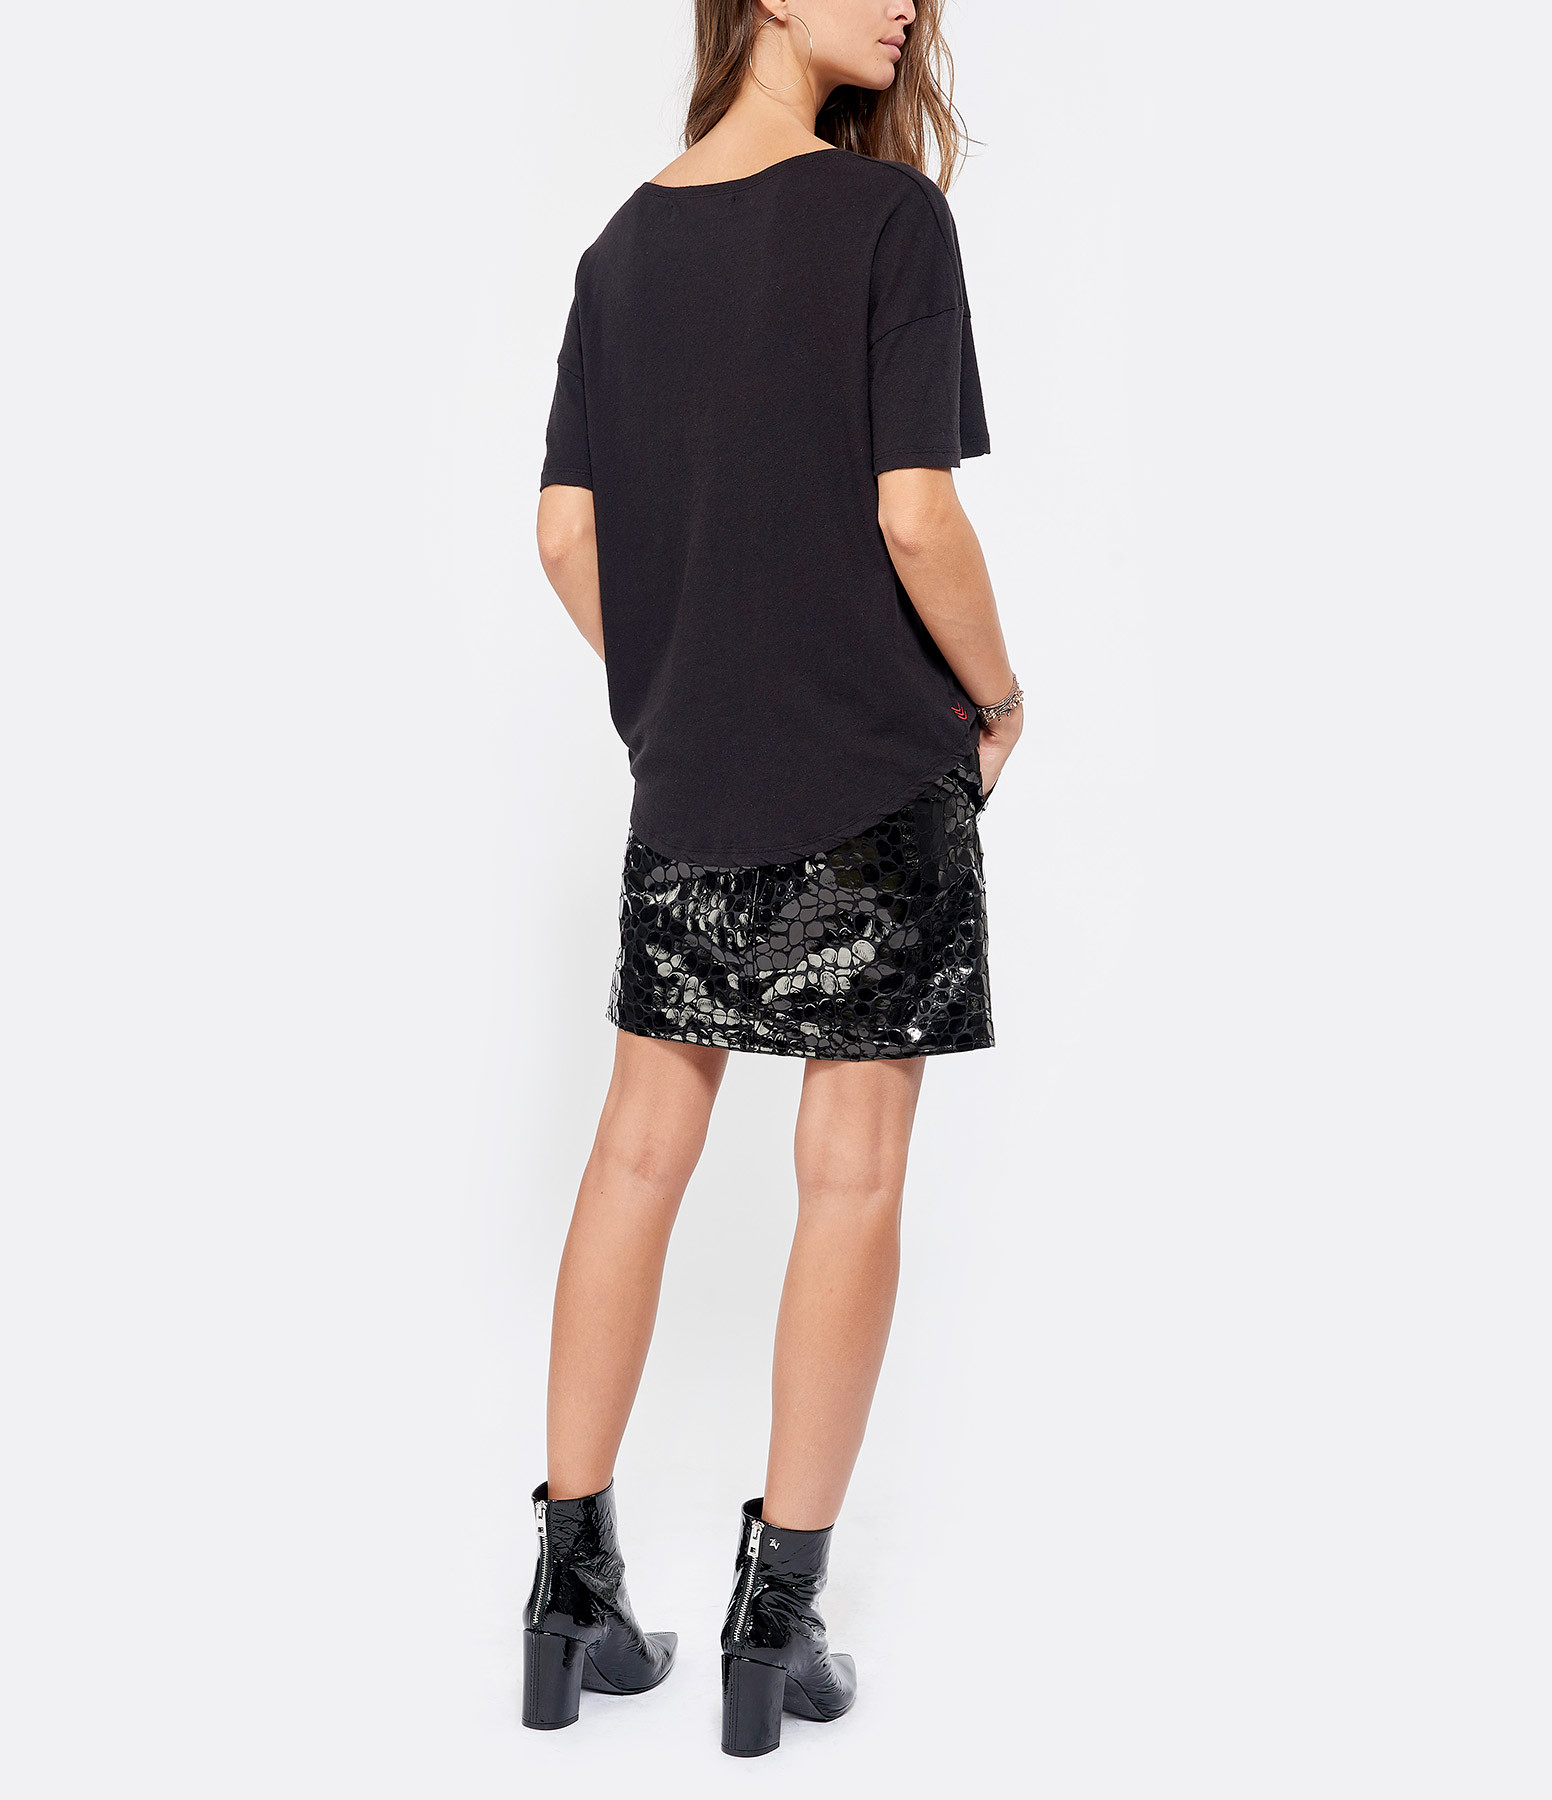 JUNE 7.2 - Tee-shirt Uma Coton Lin Noir Logo Blanc